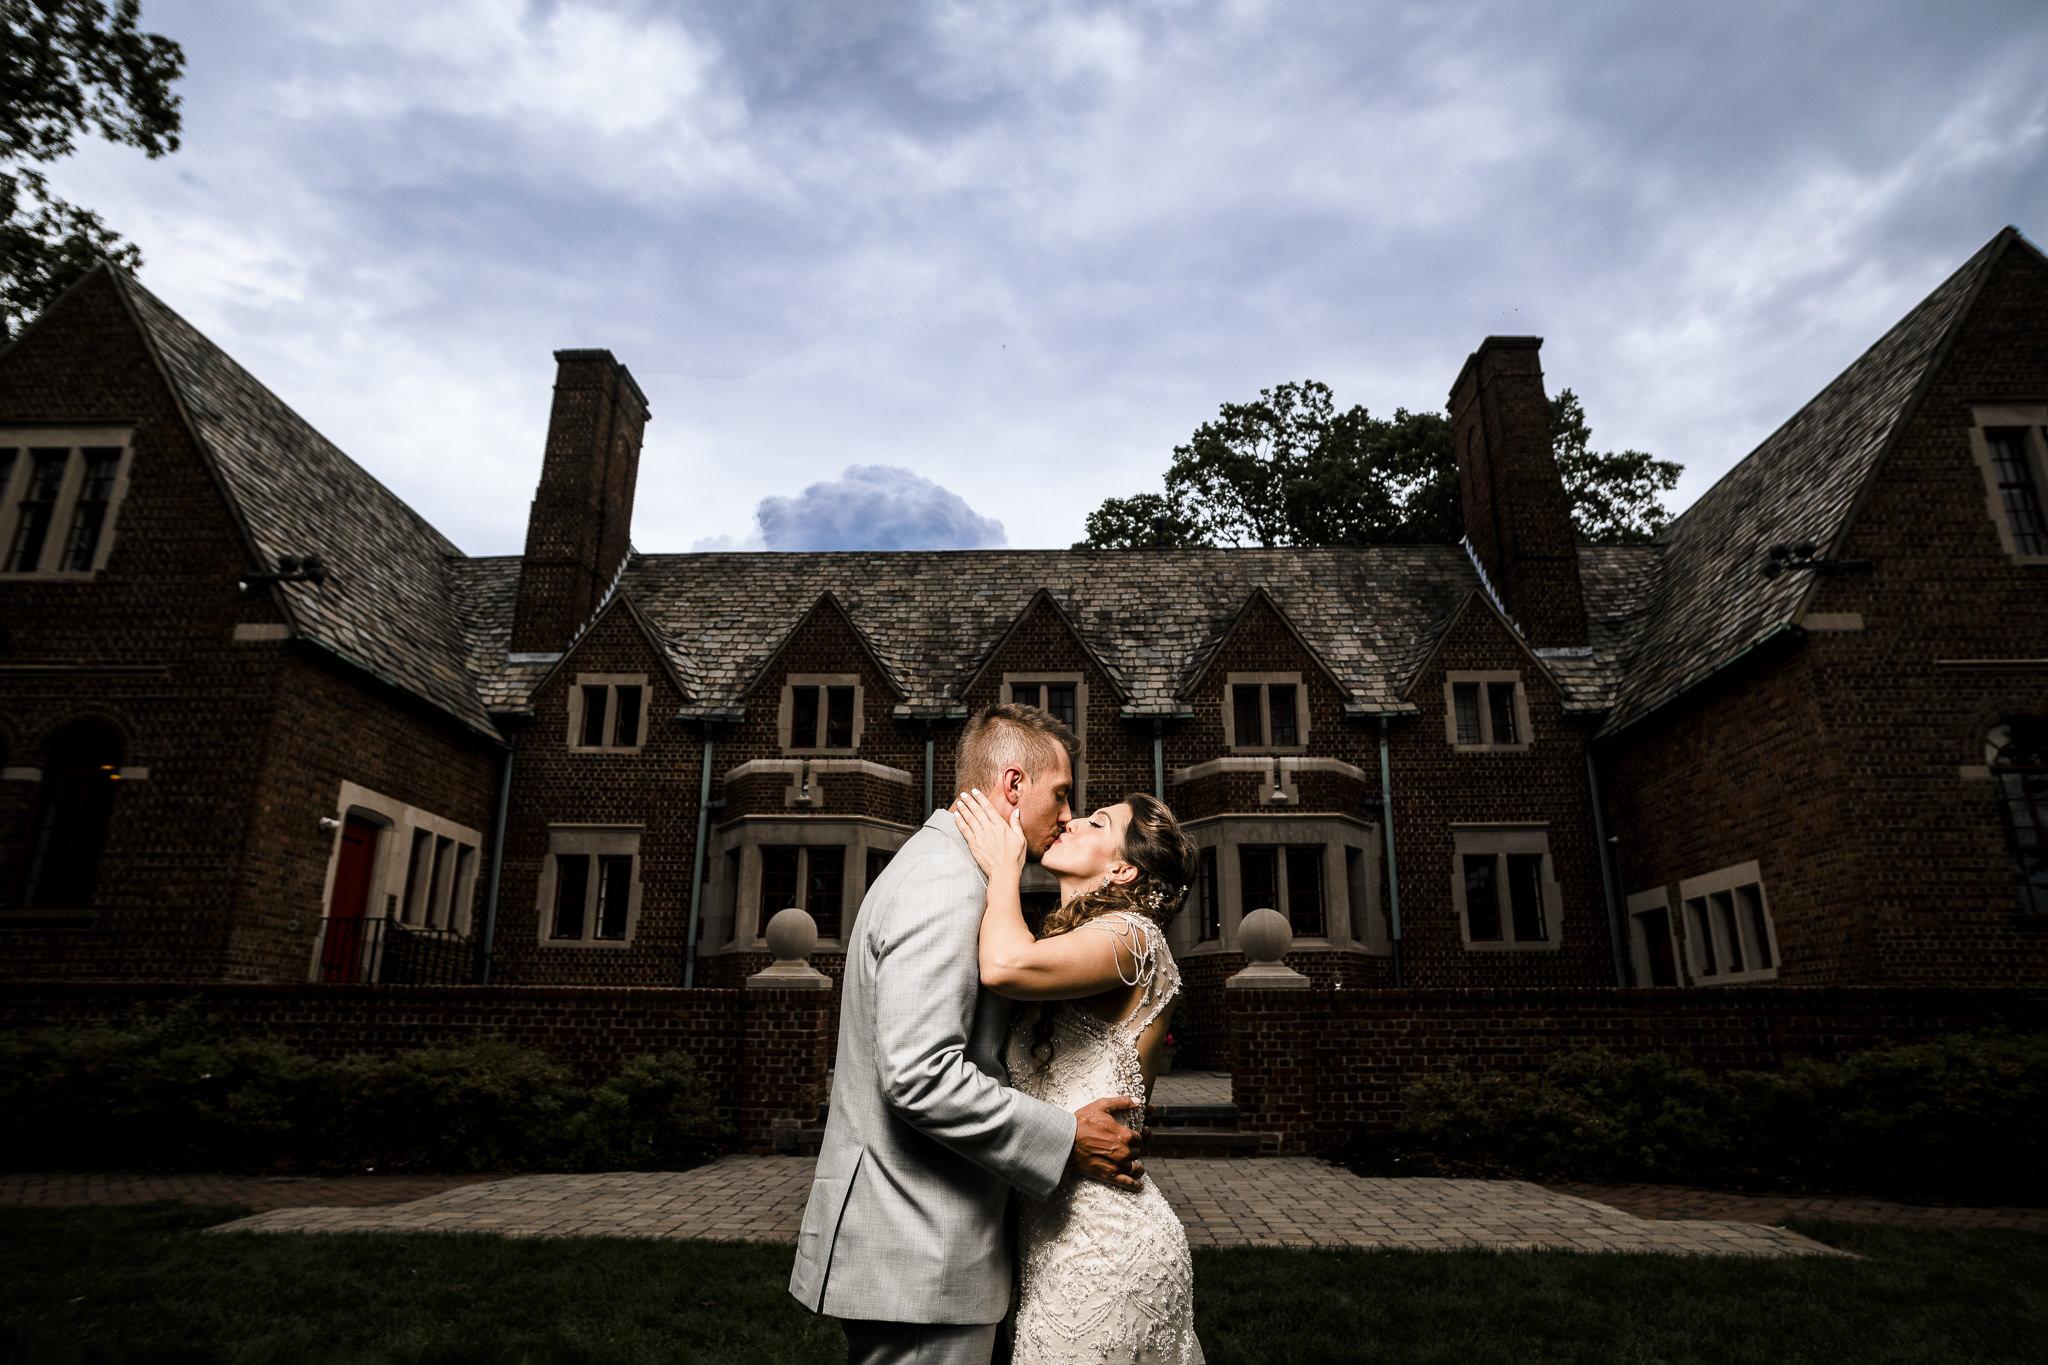 Barbato-Moorestown-Community-House-Wedding-New-Jersey-Photographer-25.JPG